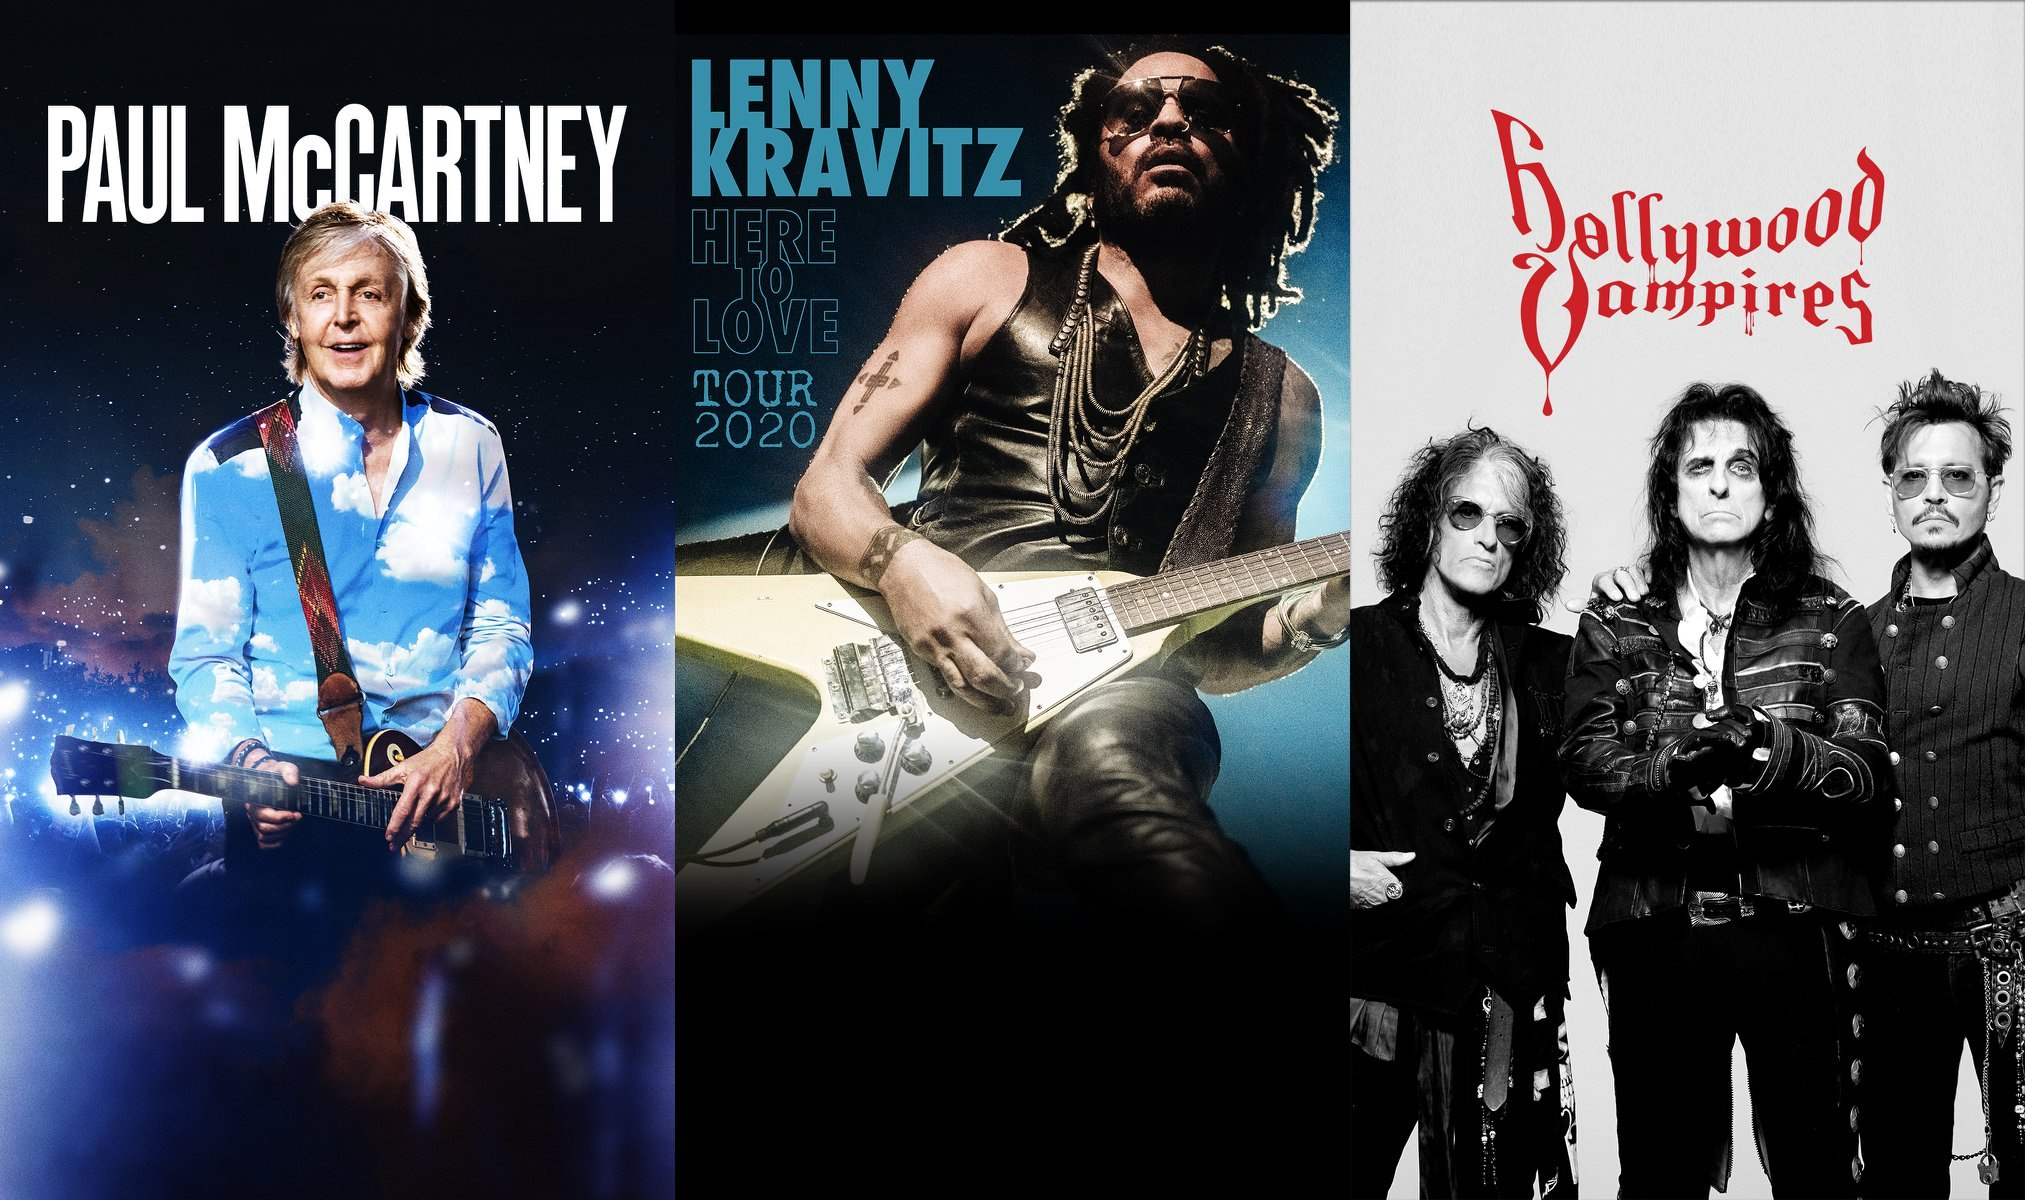 D'Alessandro e Galli: i live di Paul McCartney, Lenny Kravitz e Hollywood Vampires saranno rimborsati